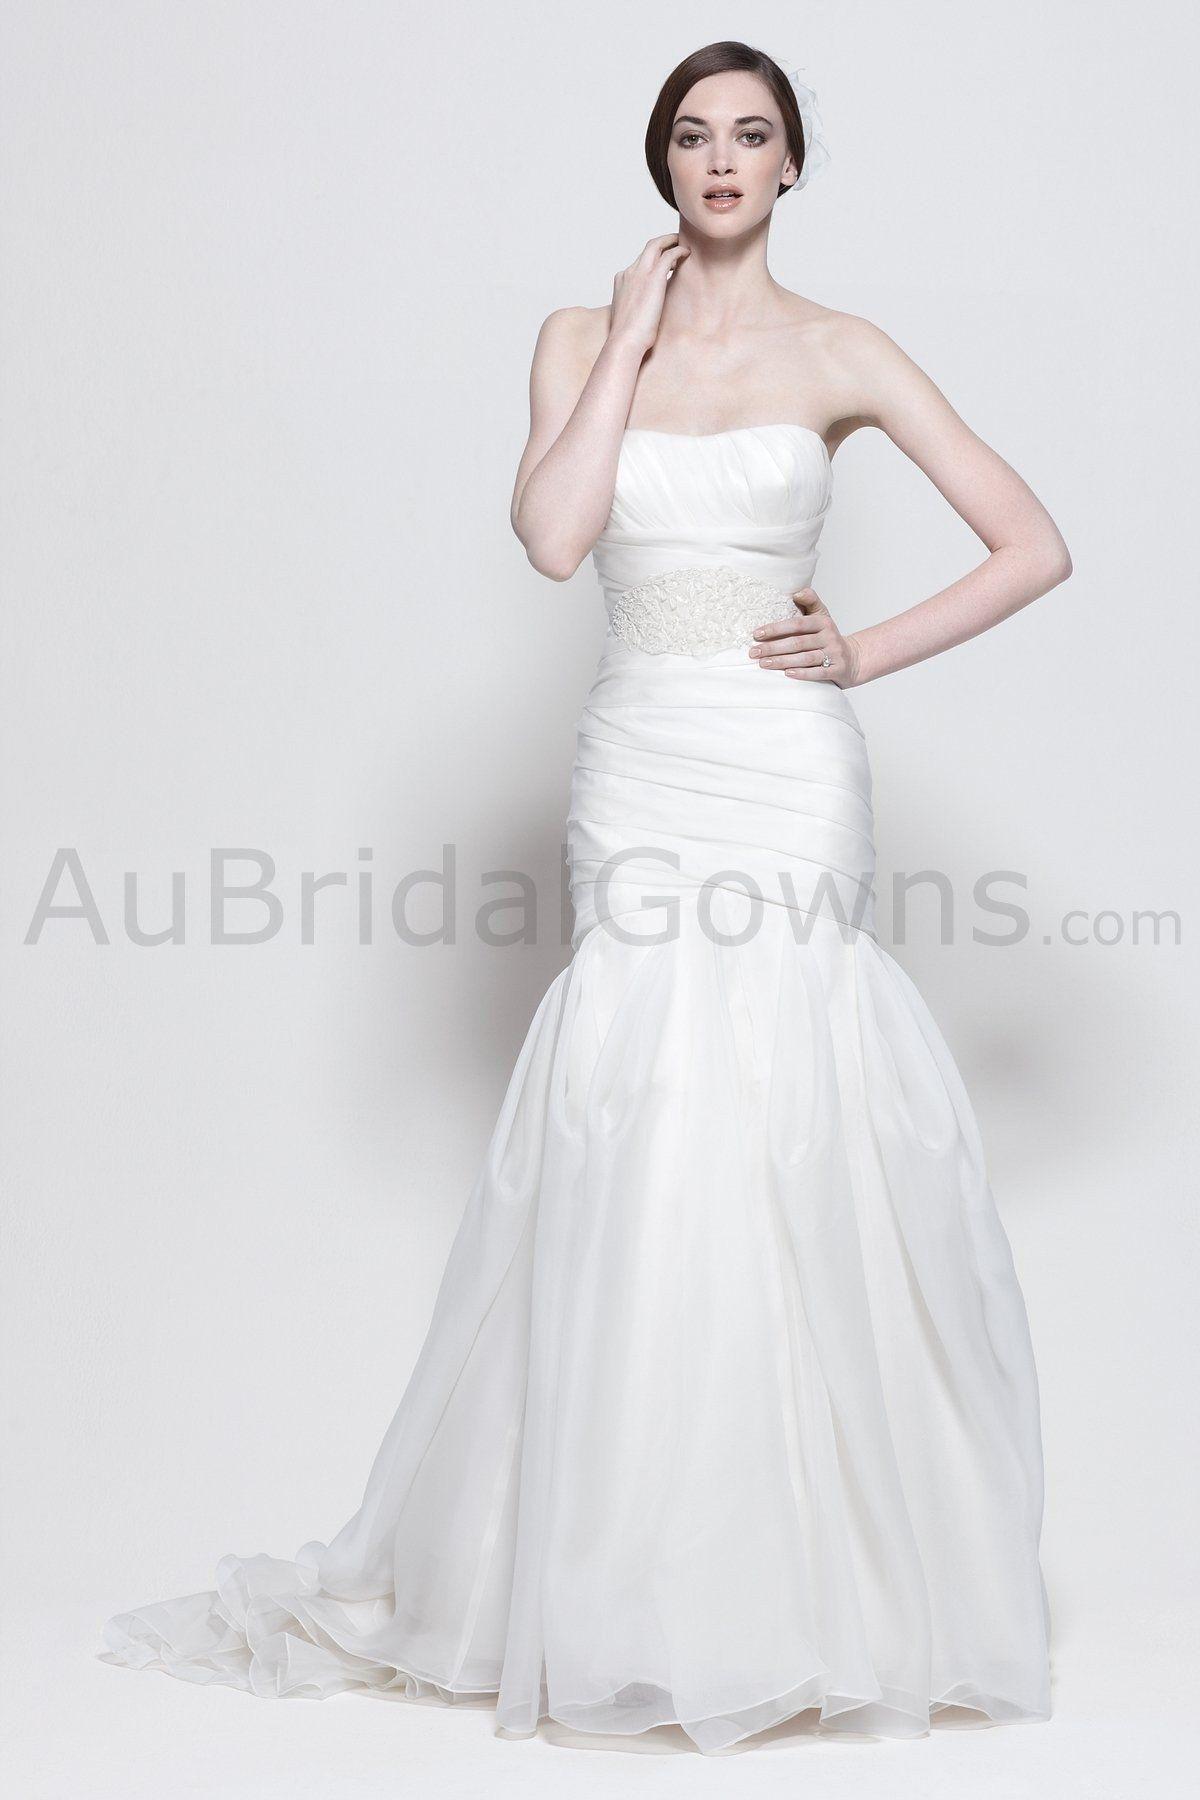 Organza Strapless Softly Curved Neckline Mermaid Wedding Dress - Wedding Dresses Australia